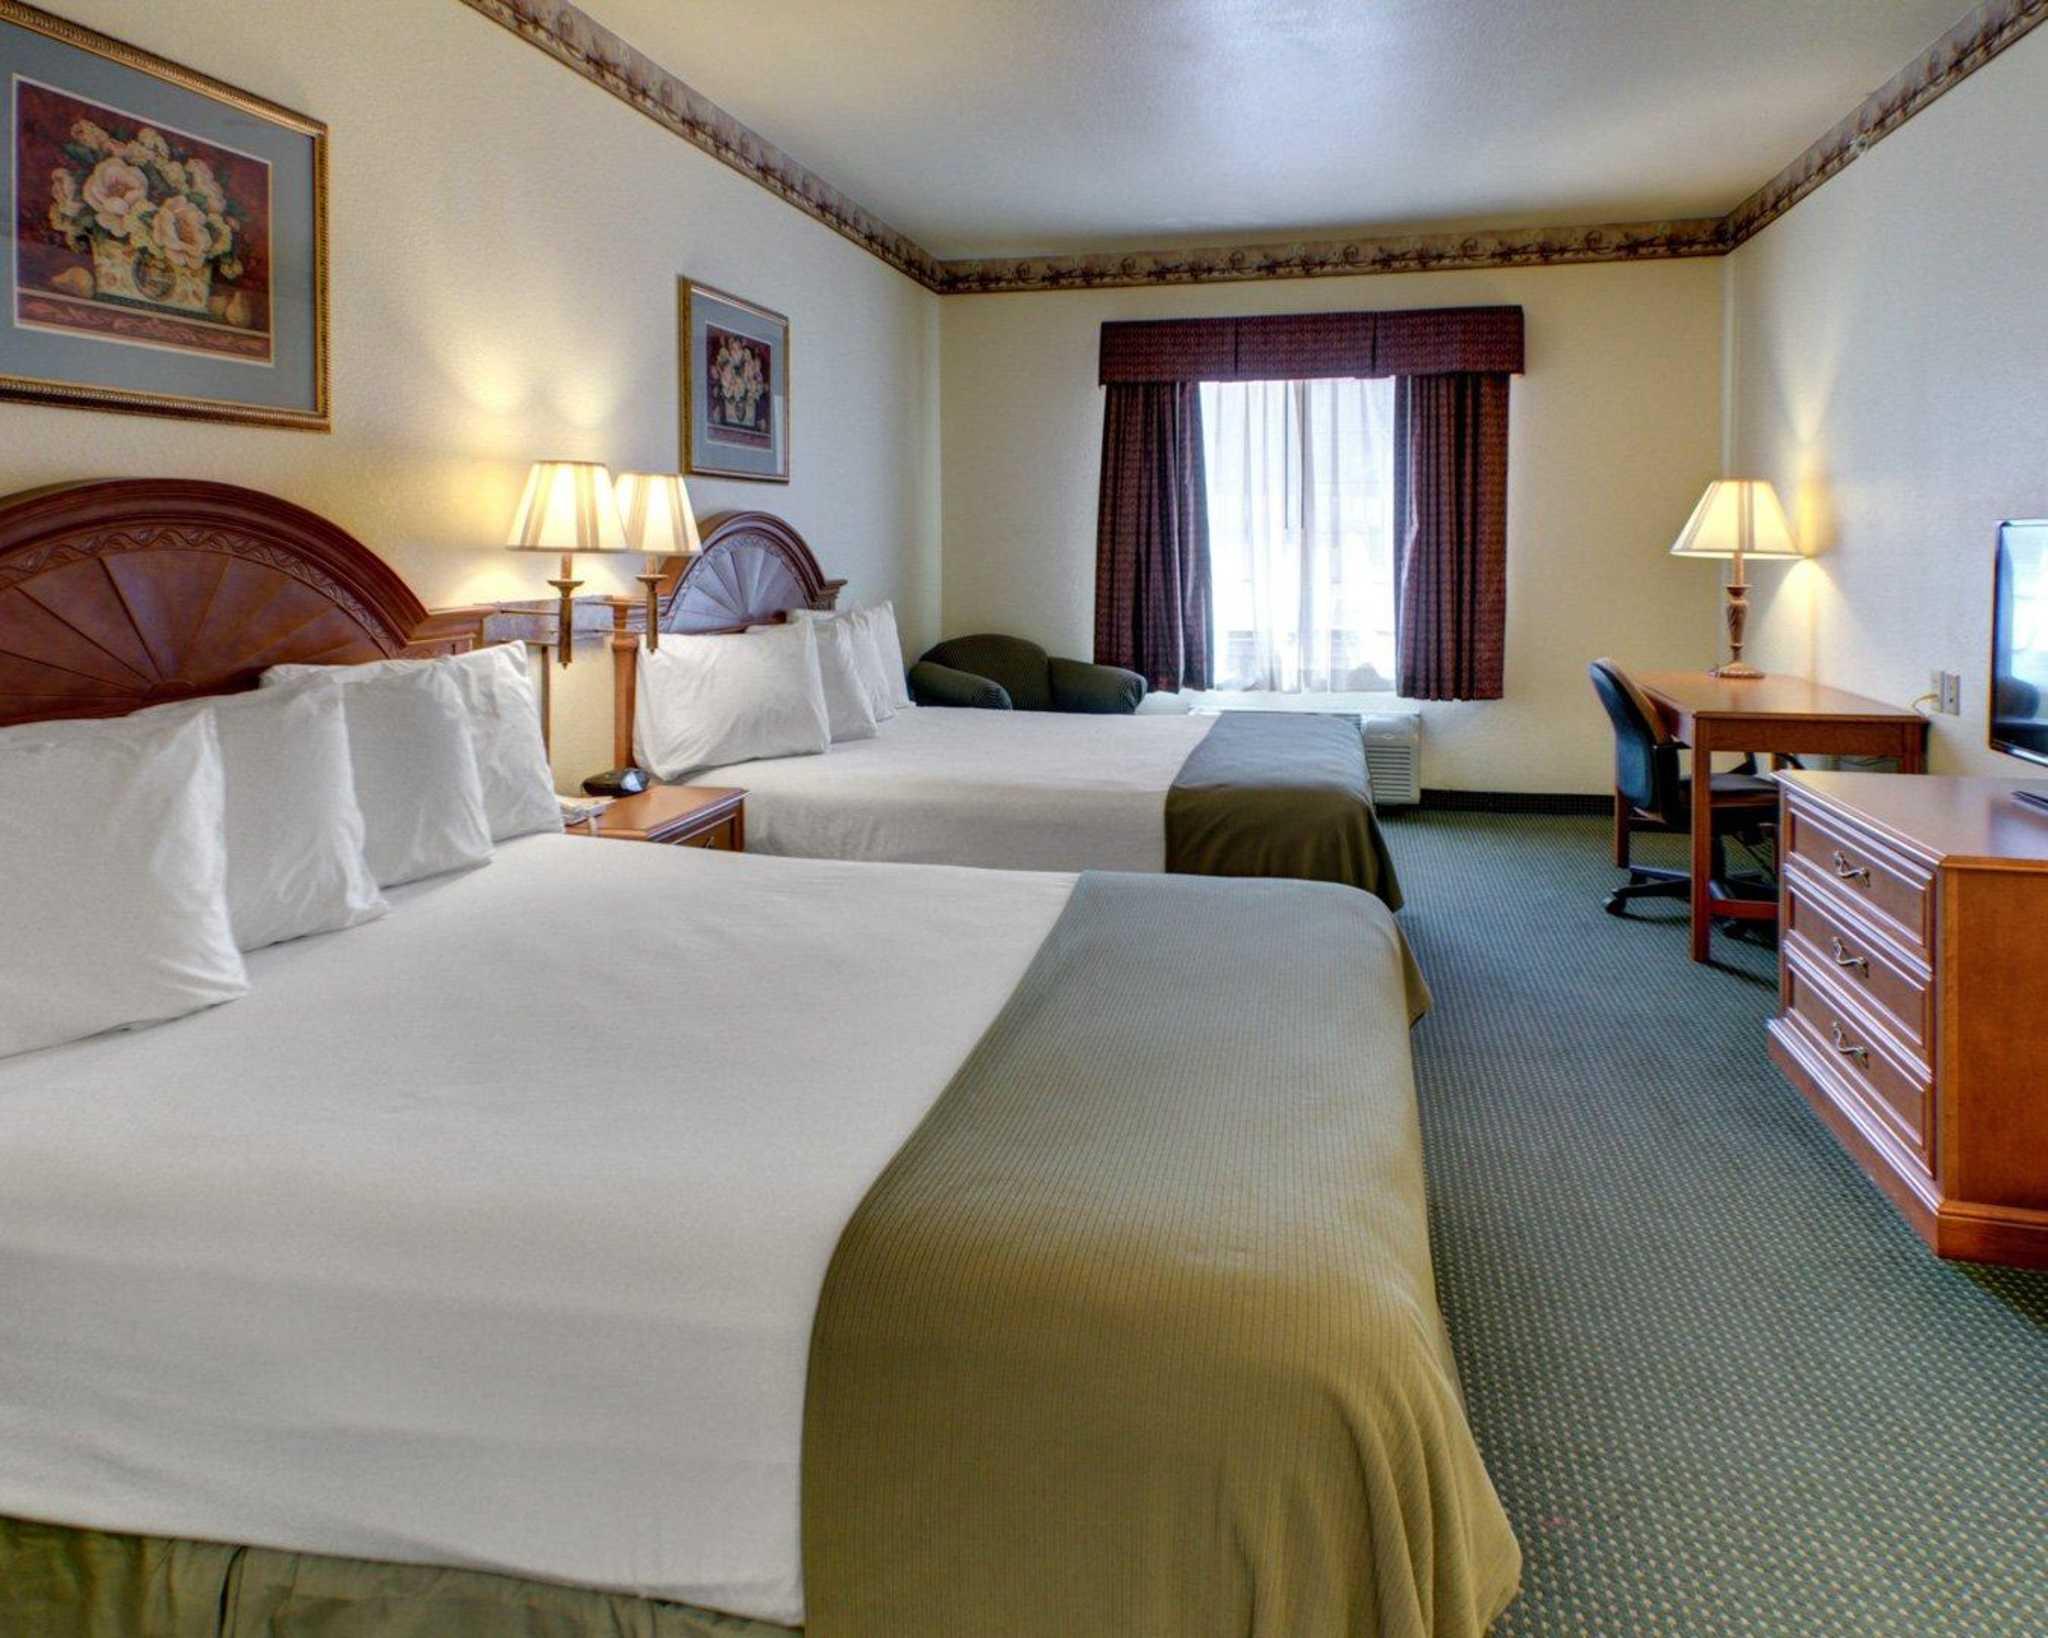 Quality Inn & Suites image 5